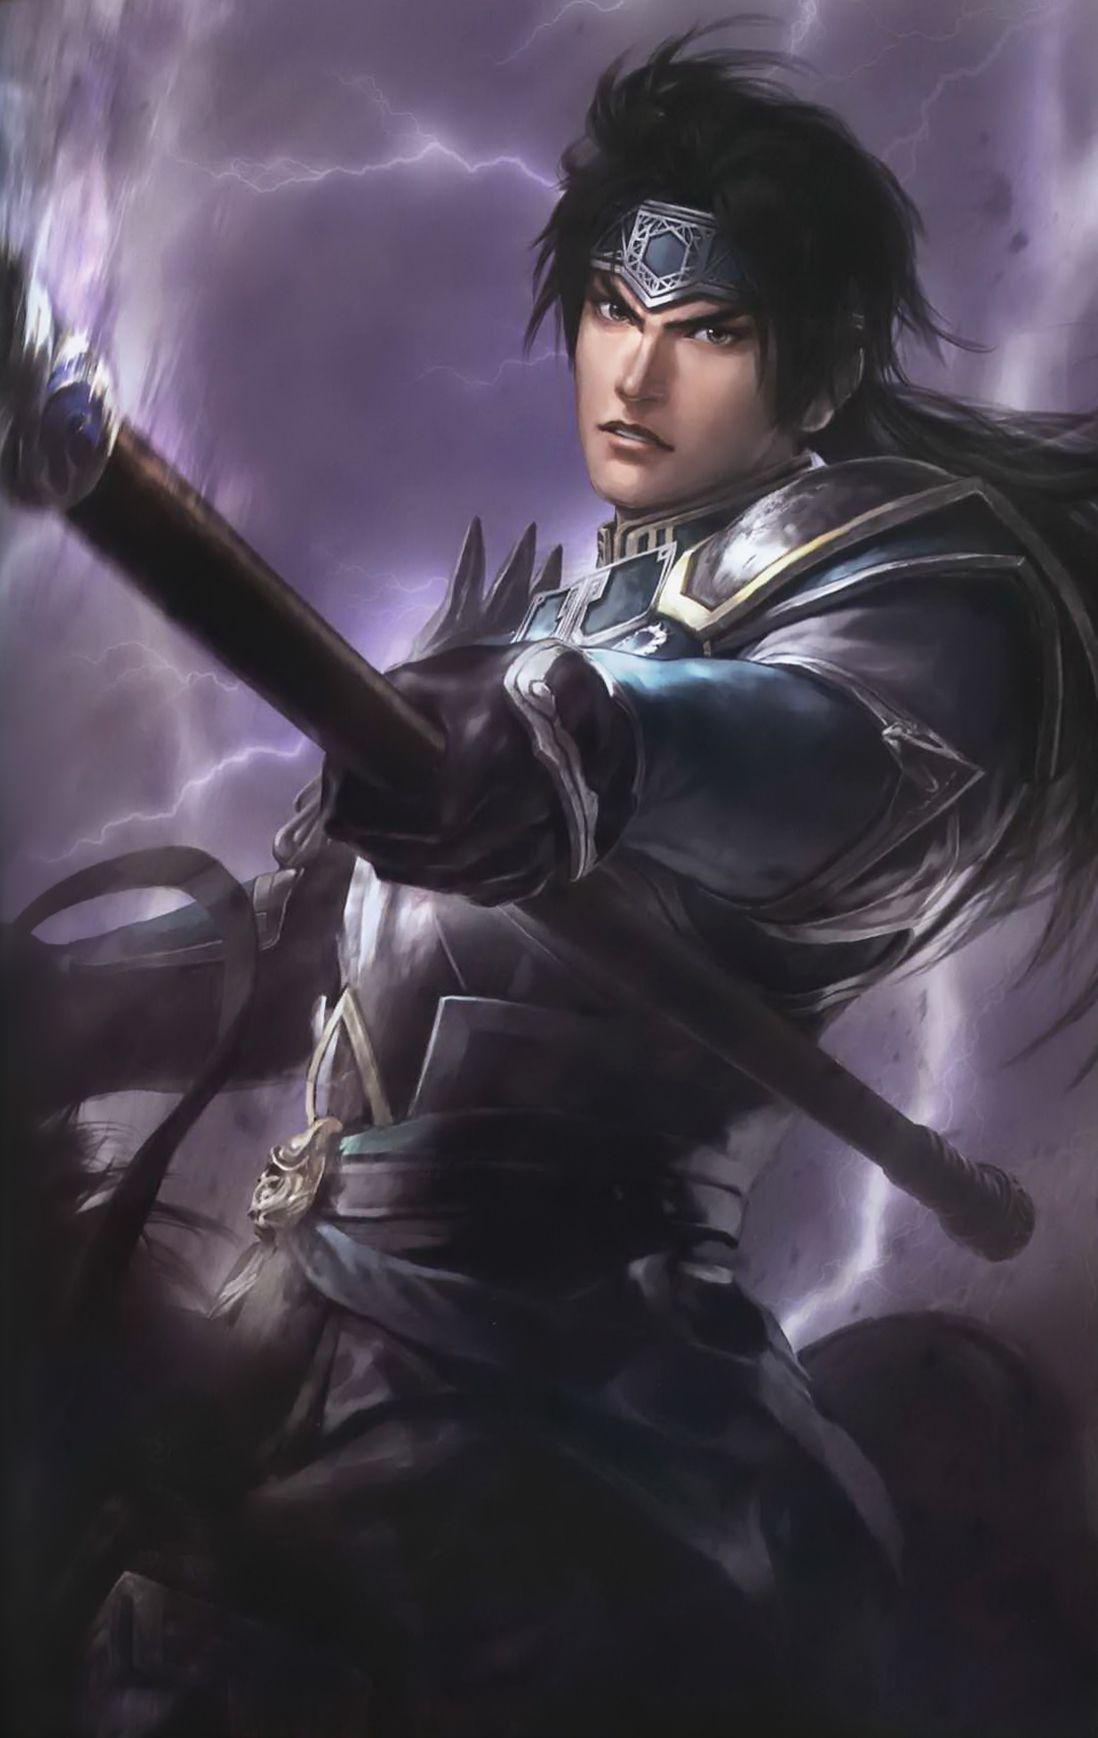 Zhao yun dynasty warriors 5